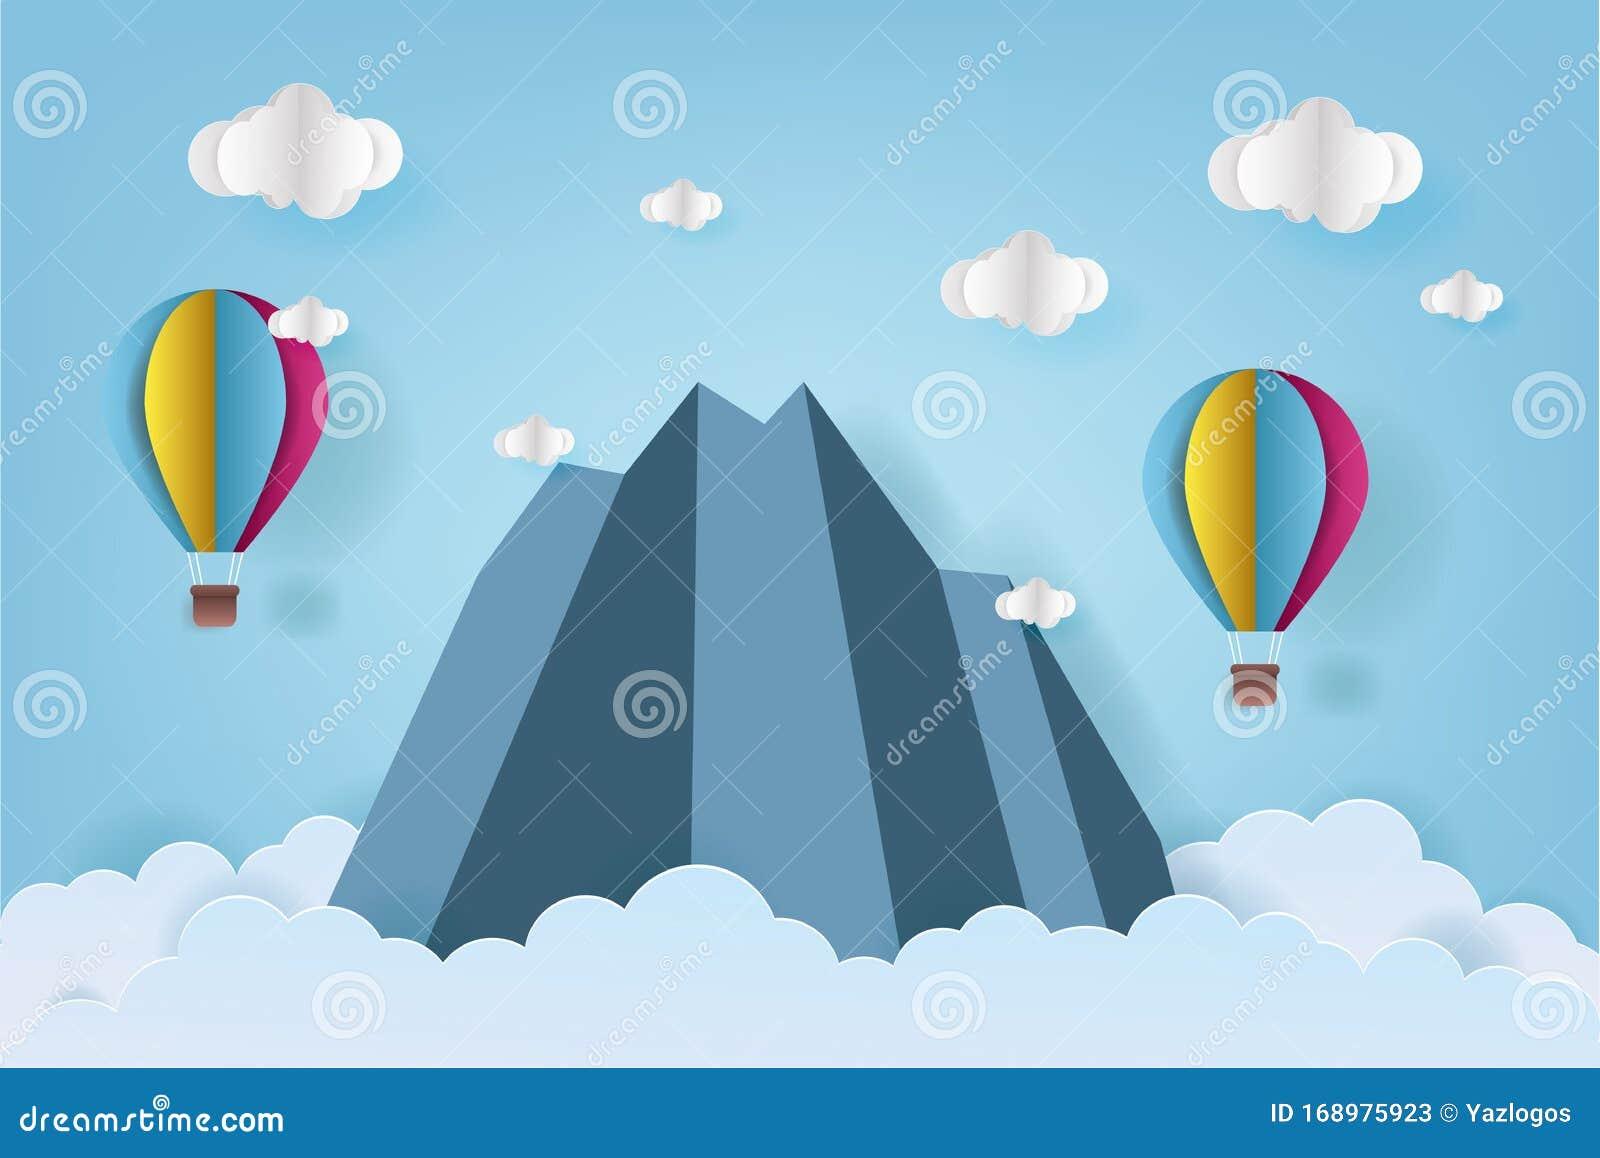 Colorful Origami Hot Air Balloon Flying Stock-Vektorgrafik ...   1157x1600